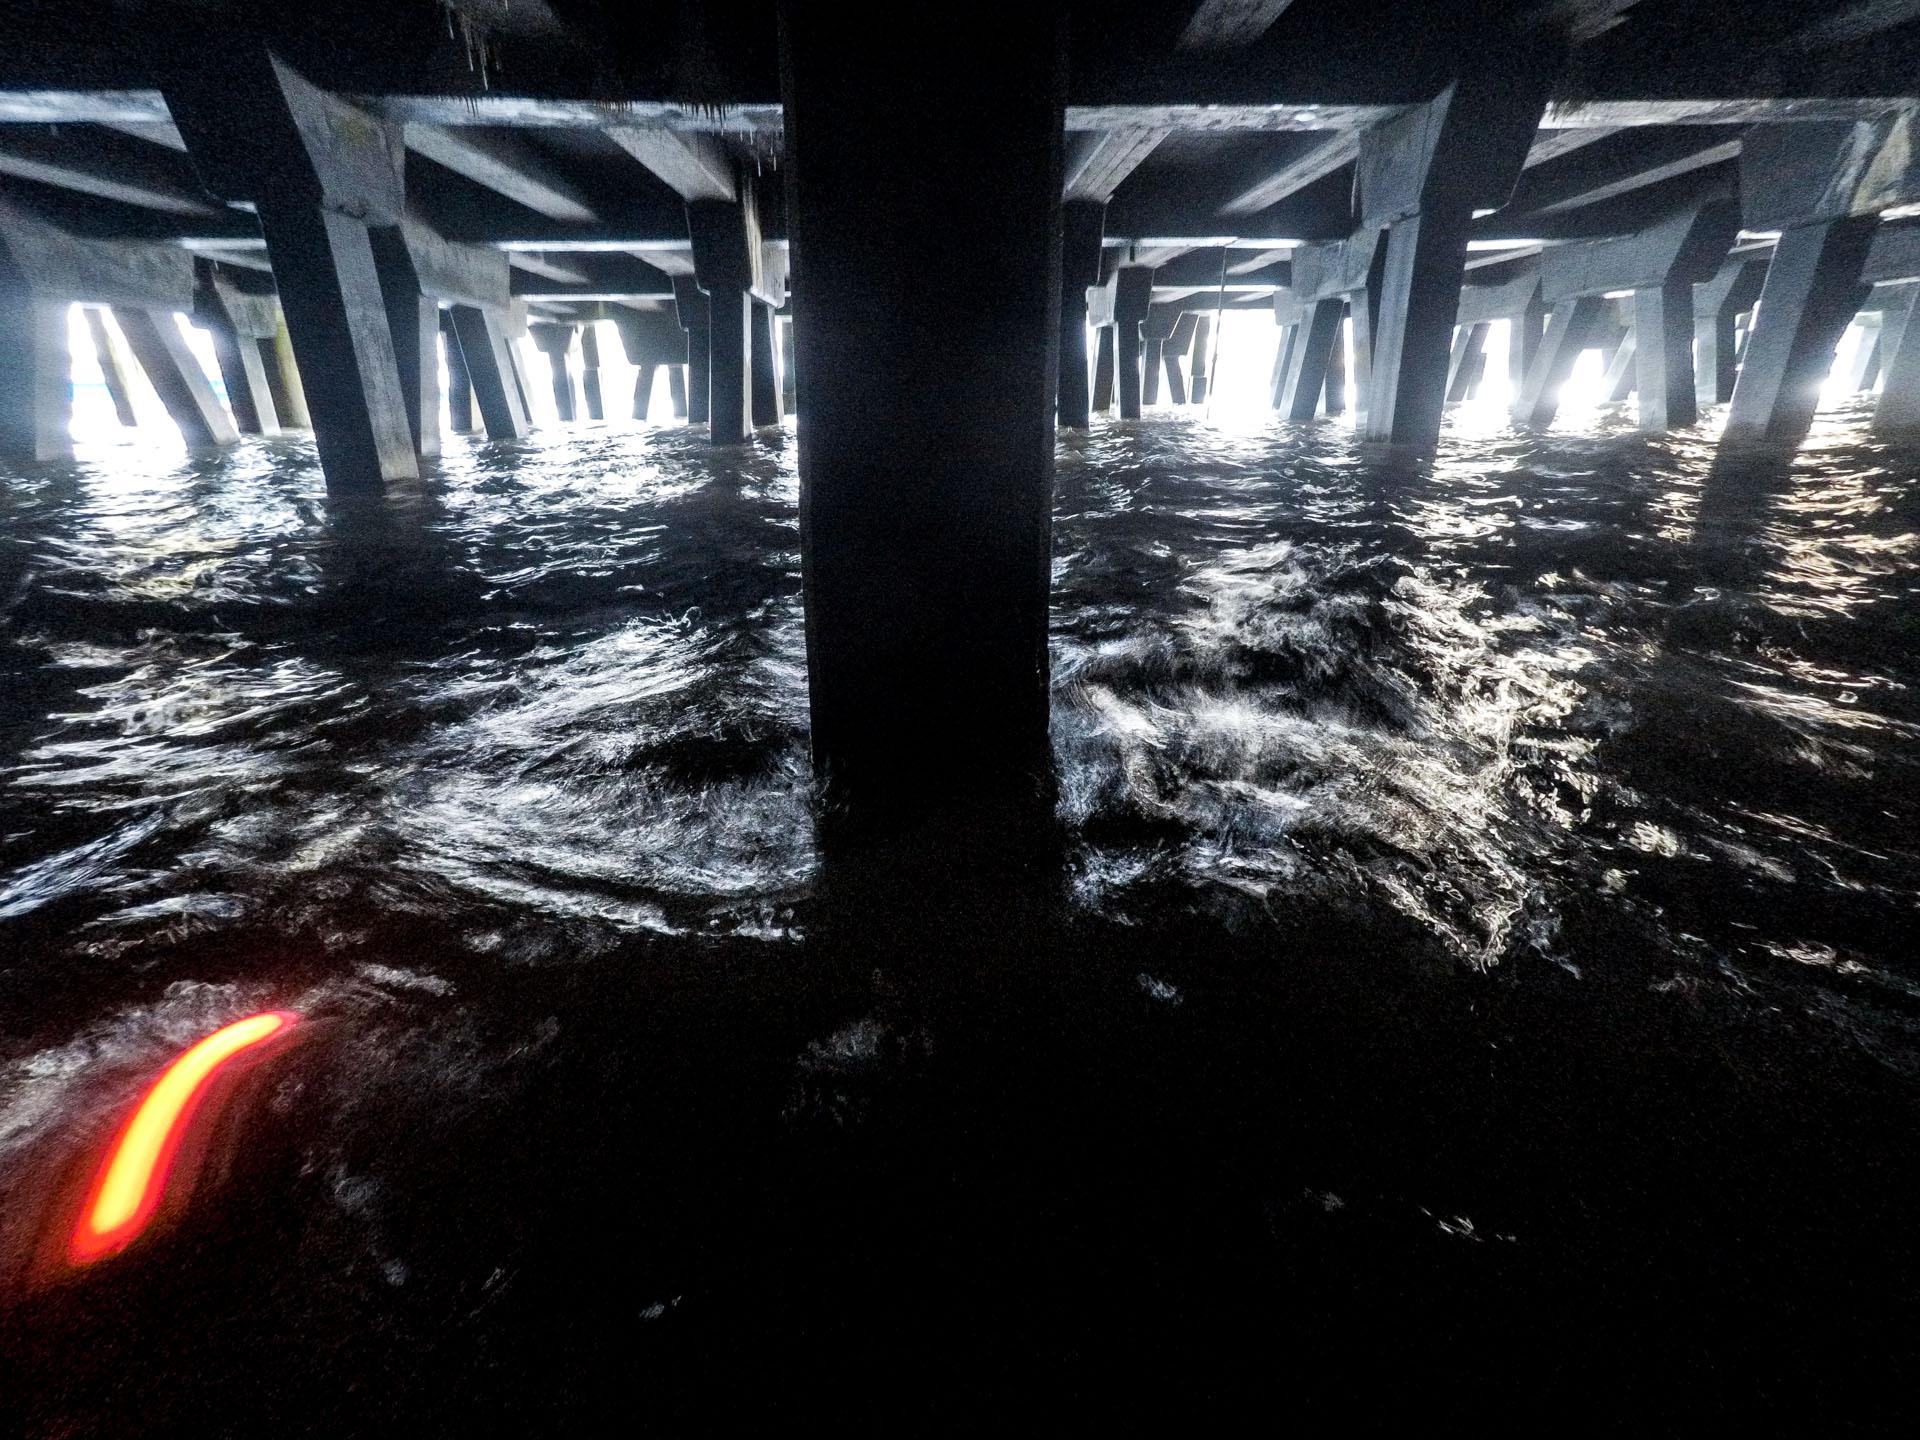 Bobby & Stillman, Thames Tides time-lapse. Susi Arnott & Crispin Hughes